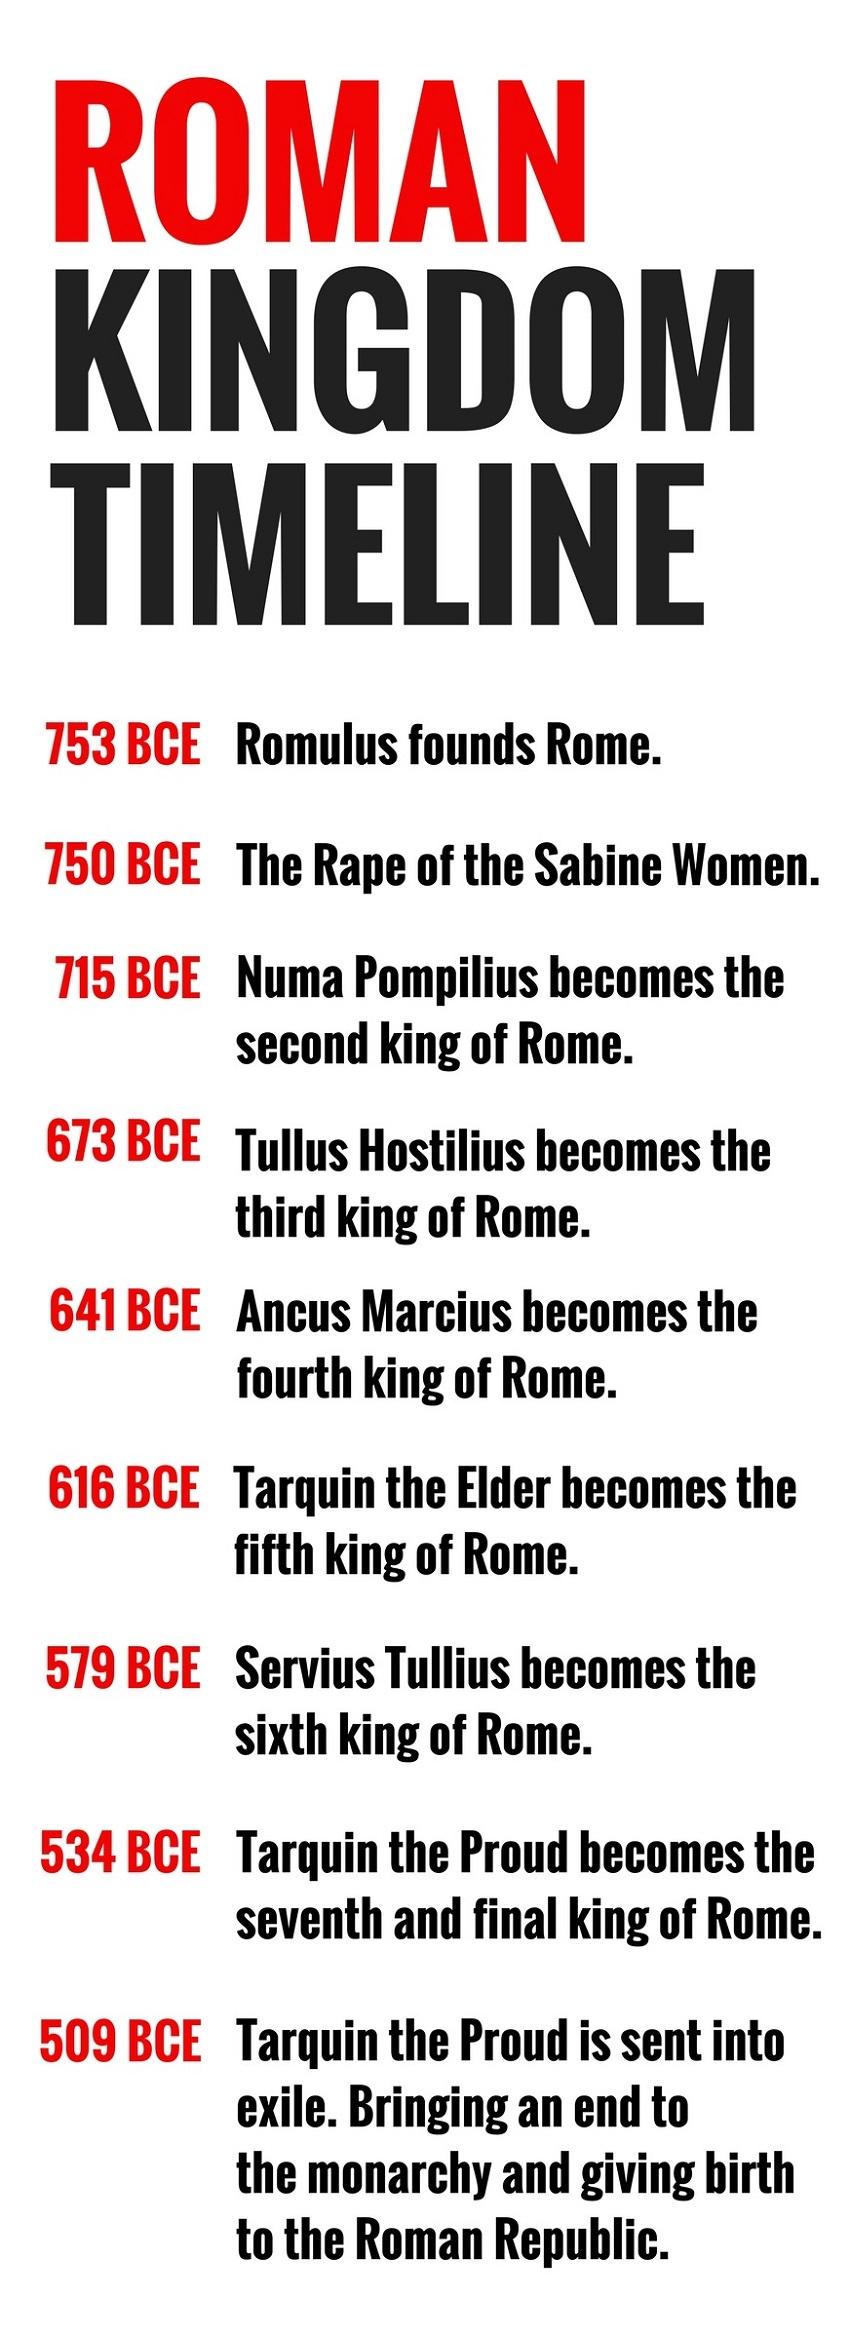 Roman Kingdom Timeline